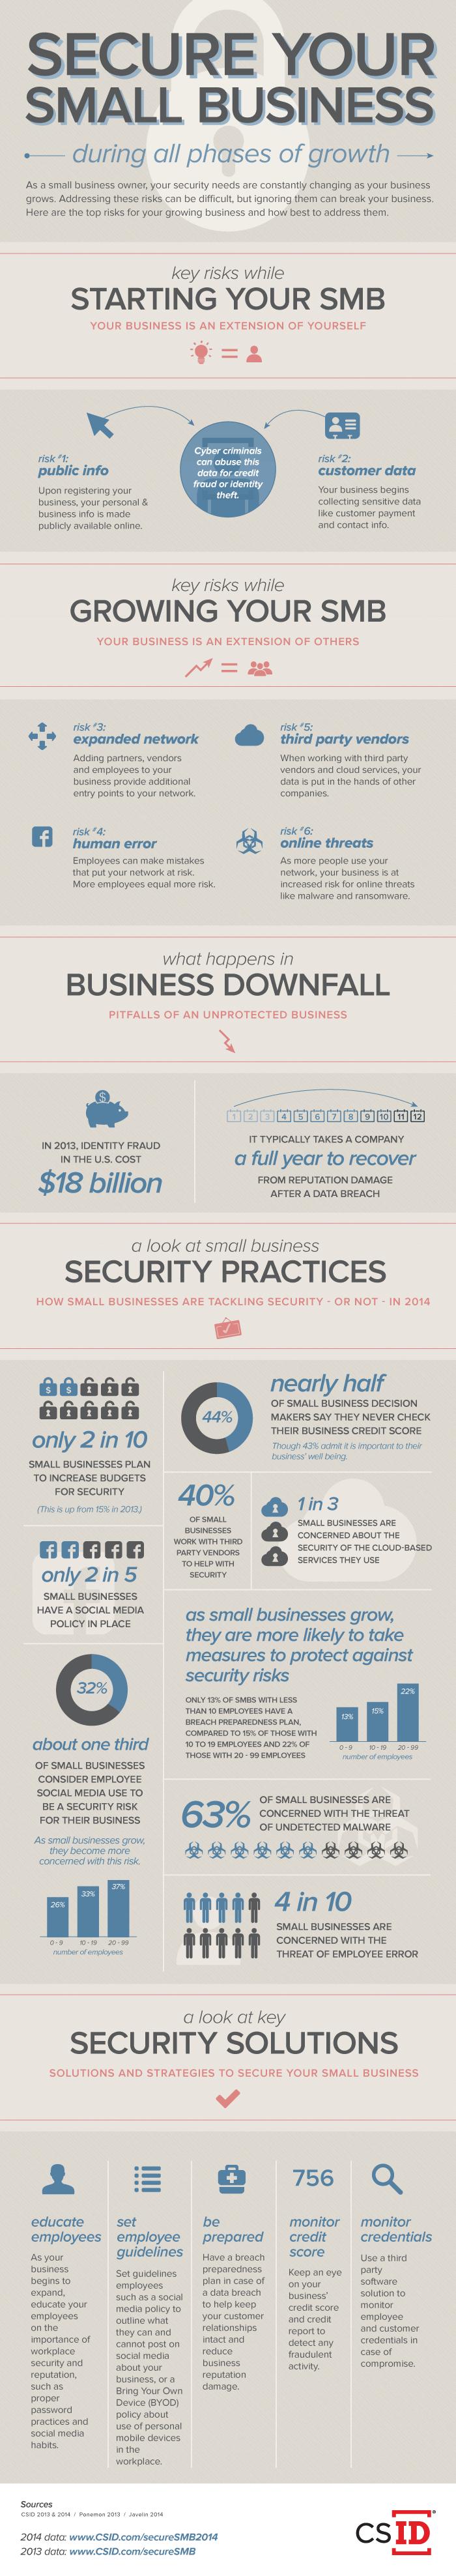 CS_Infographic_SMB2014_FINALweb3